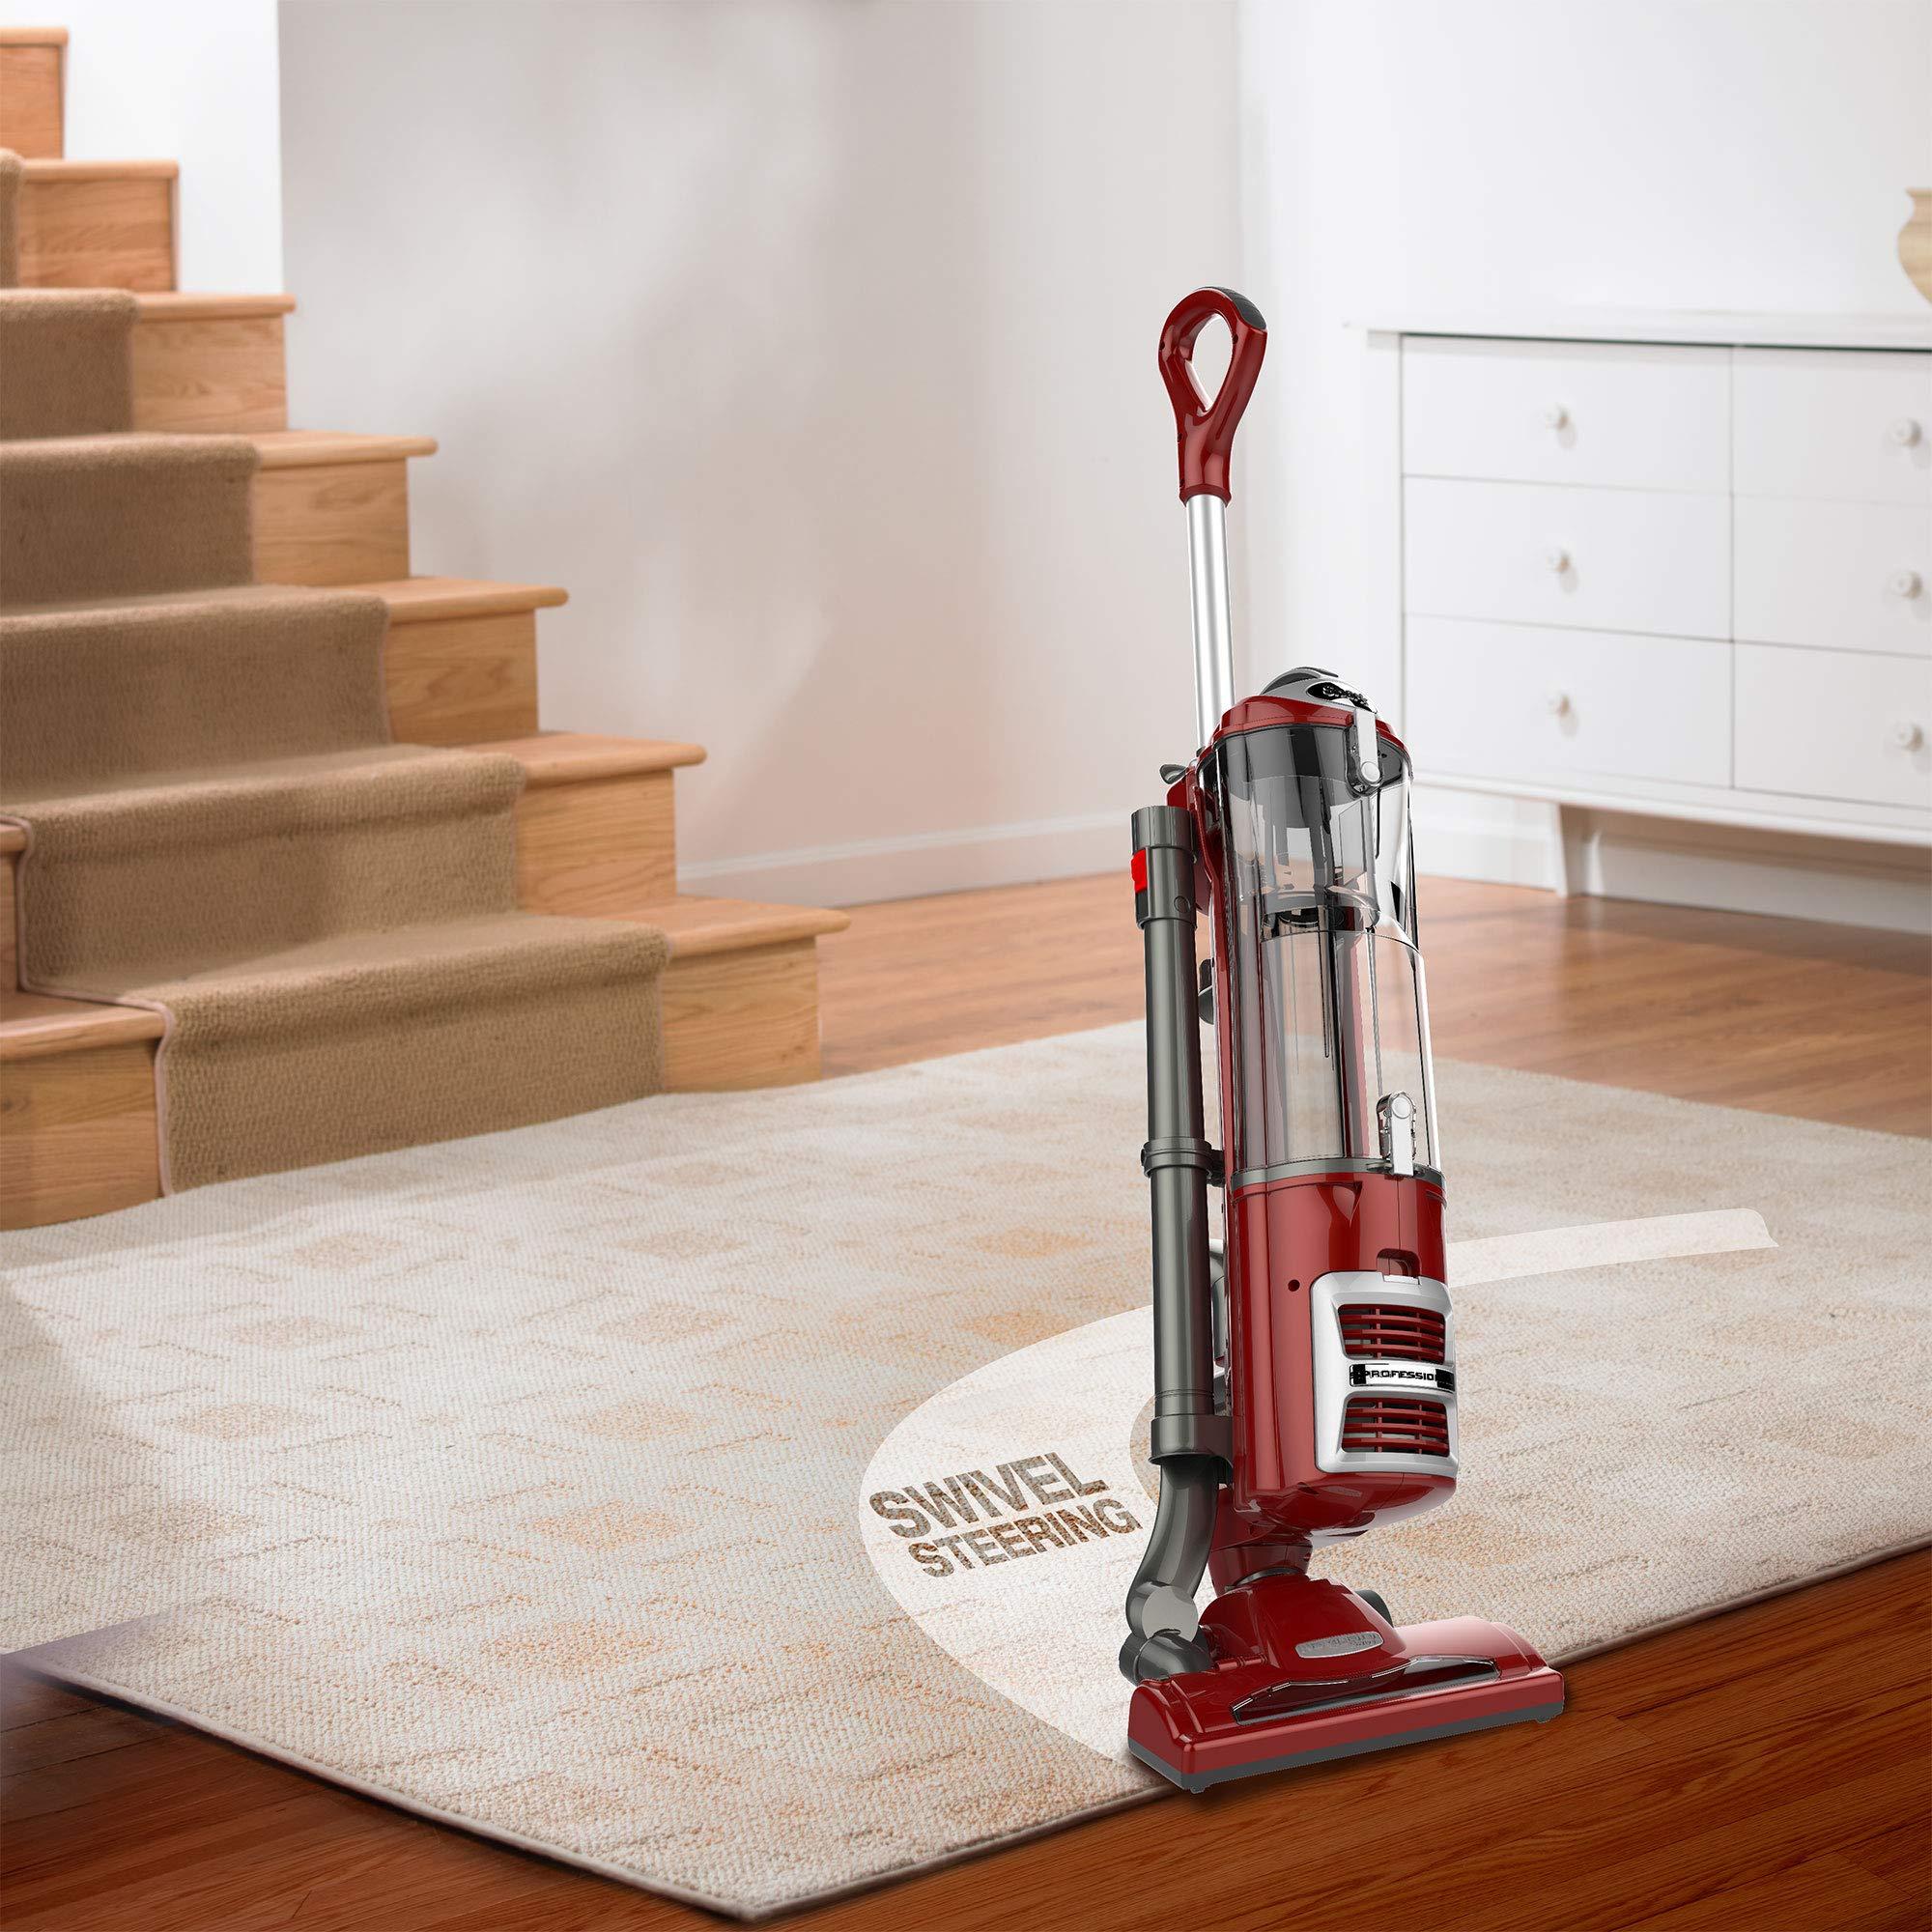 Shark NV60 Navigator Professional Upright Vacuum, Red by Shark (Image #3)